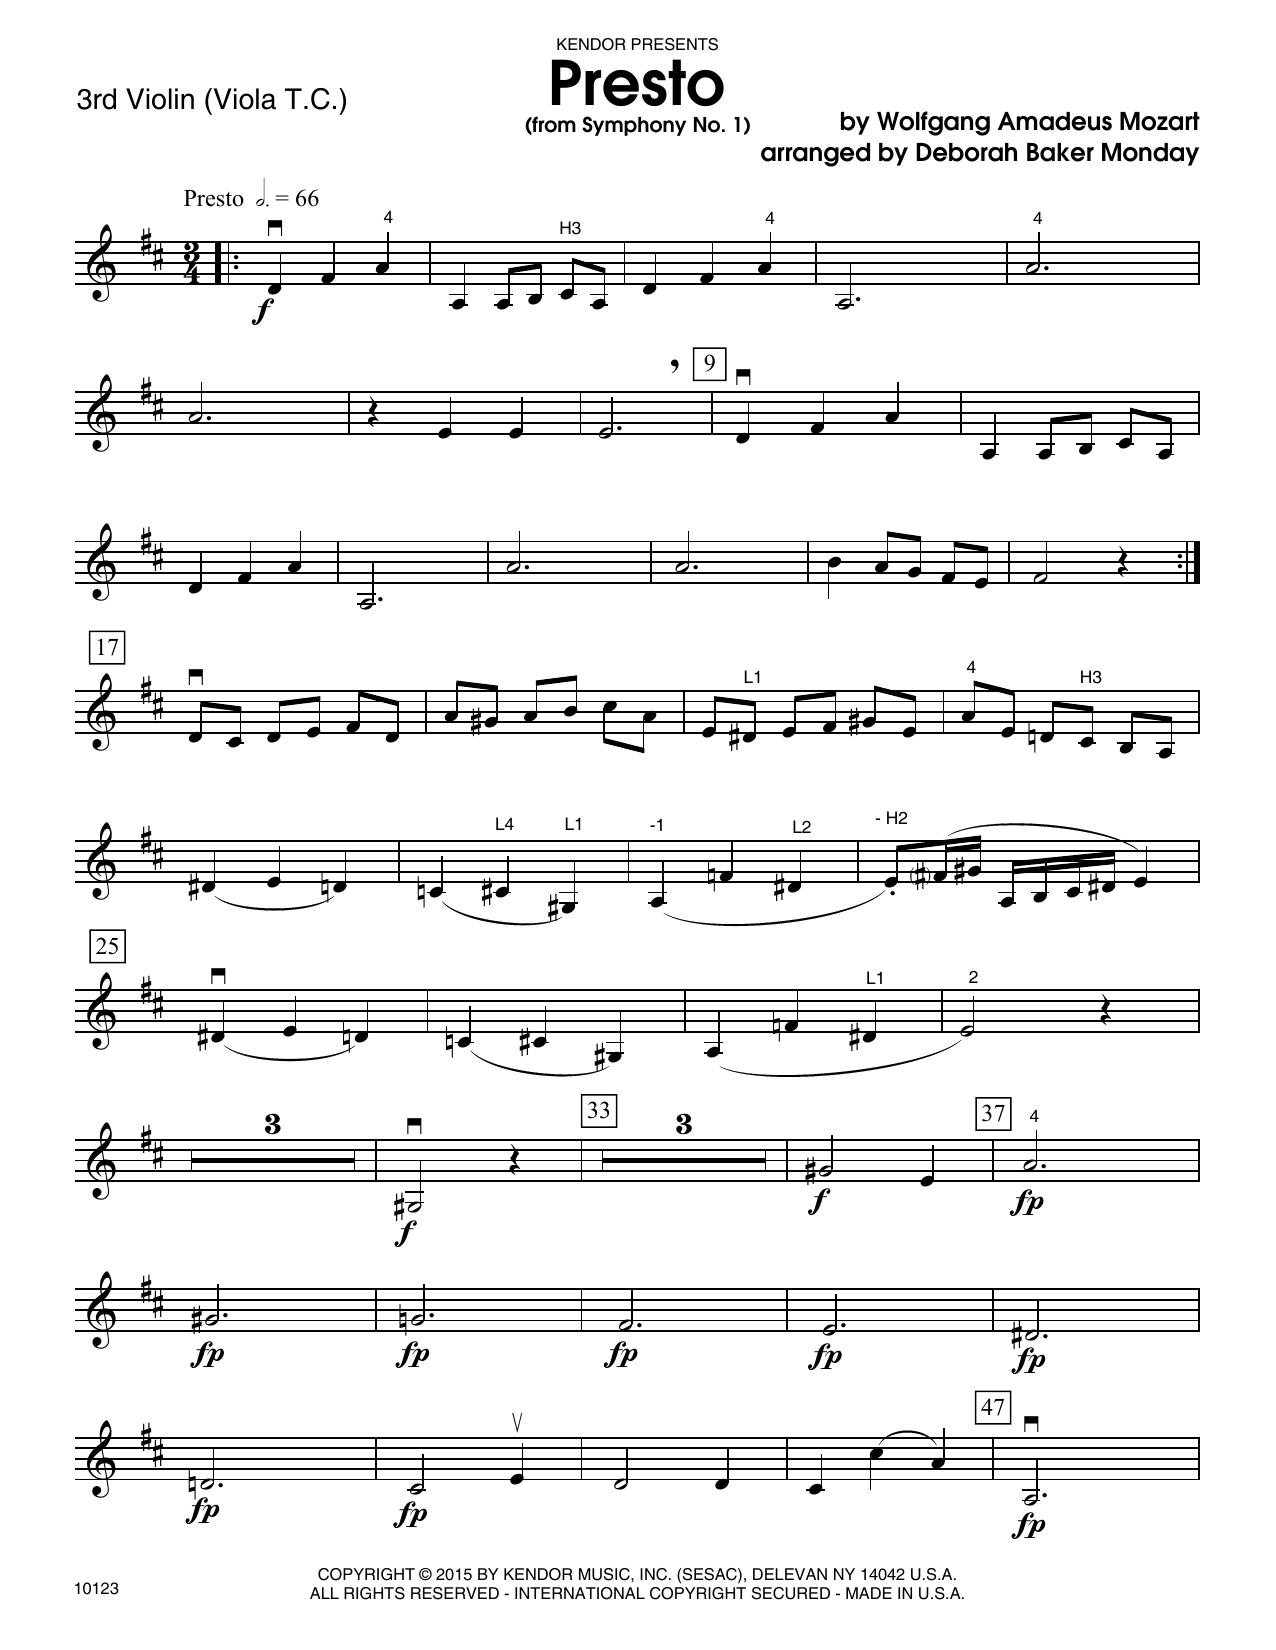 Mozart - Presto (from Symphony No. 1) - Violin 3 (Viola T.C.)